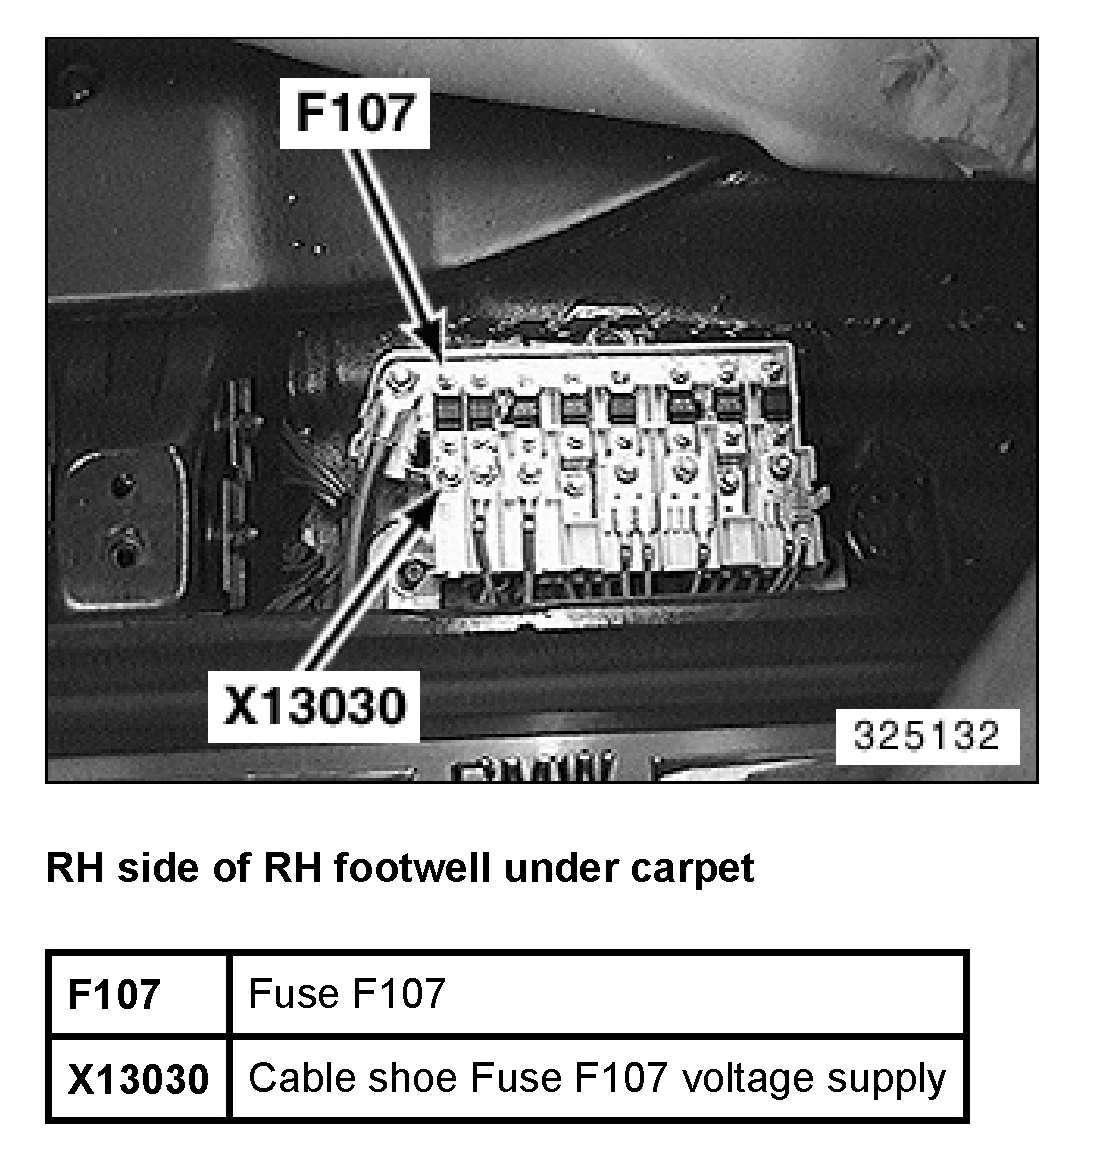 Trailblazer Air Pump Fuse Diagram Manual Of Wiring 2005 Bmw 530i Secondary Trusted Diagrams Rh Wiringhubme Today 2004 Chevy